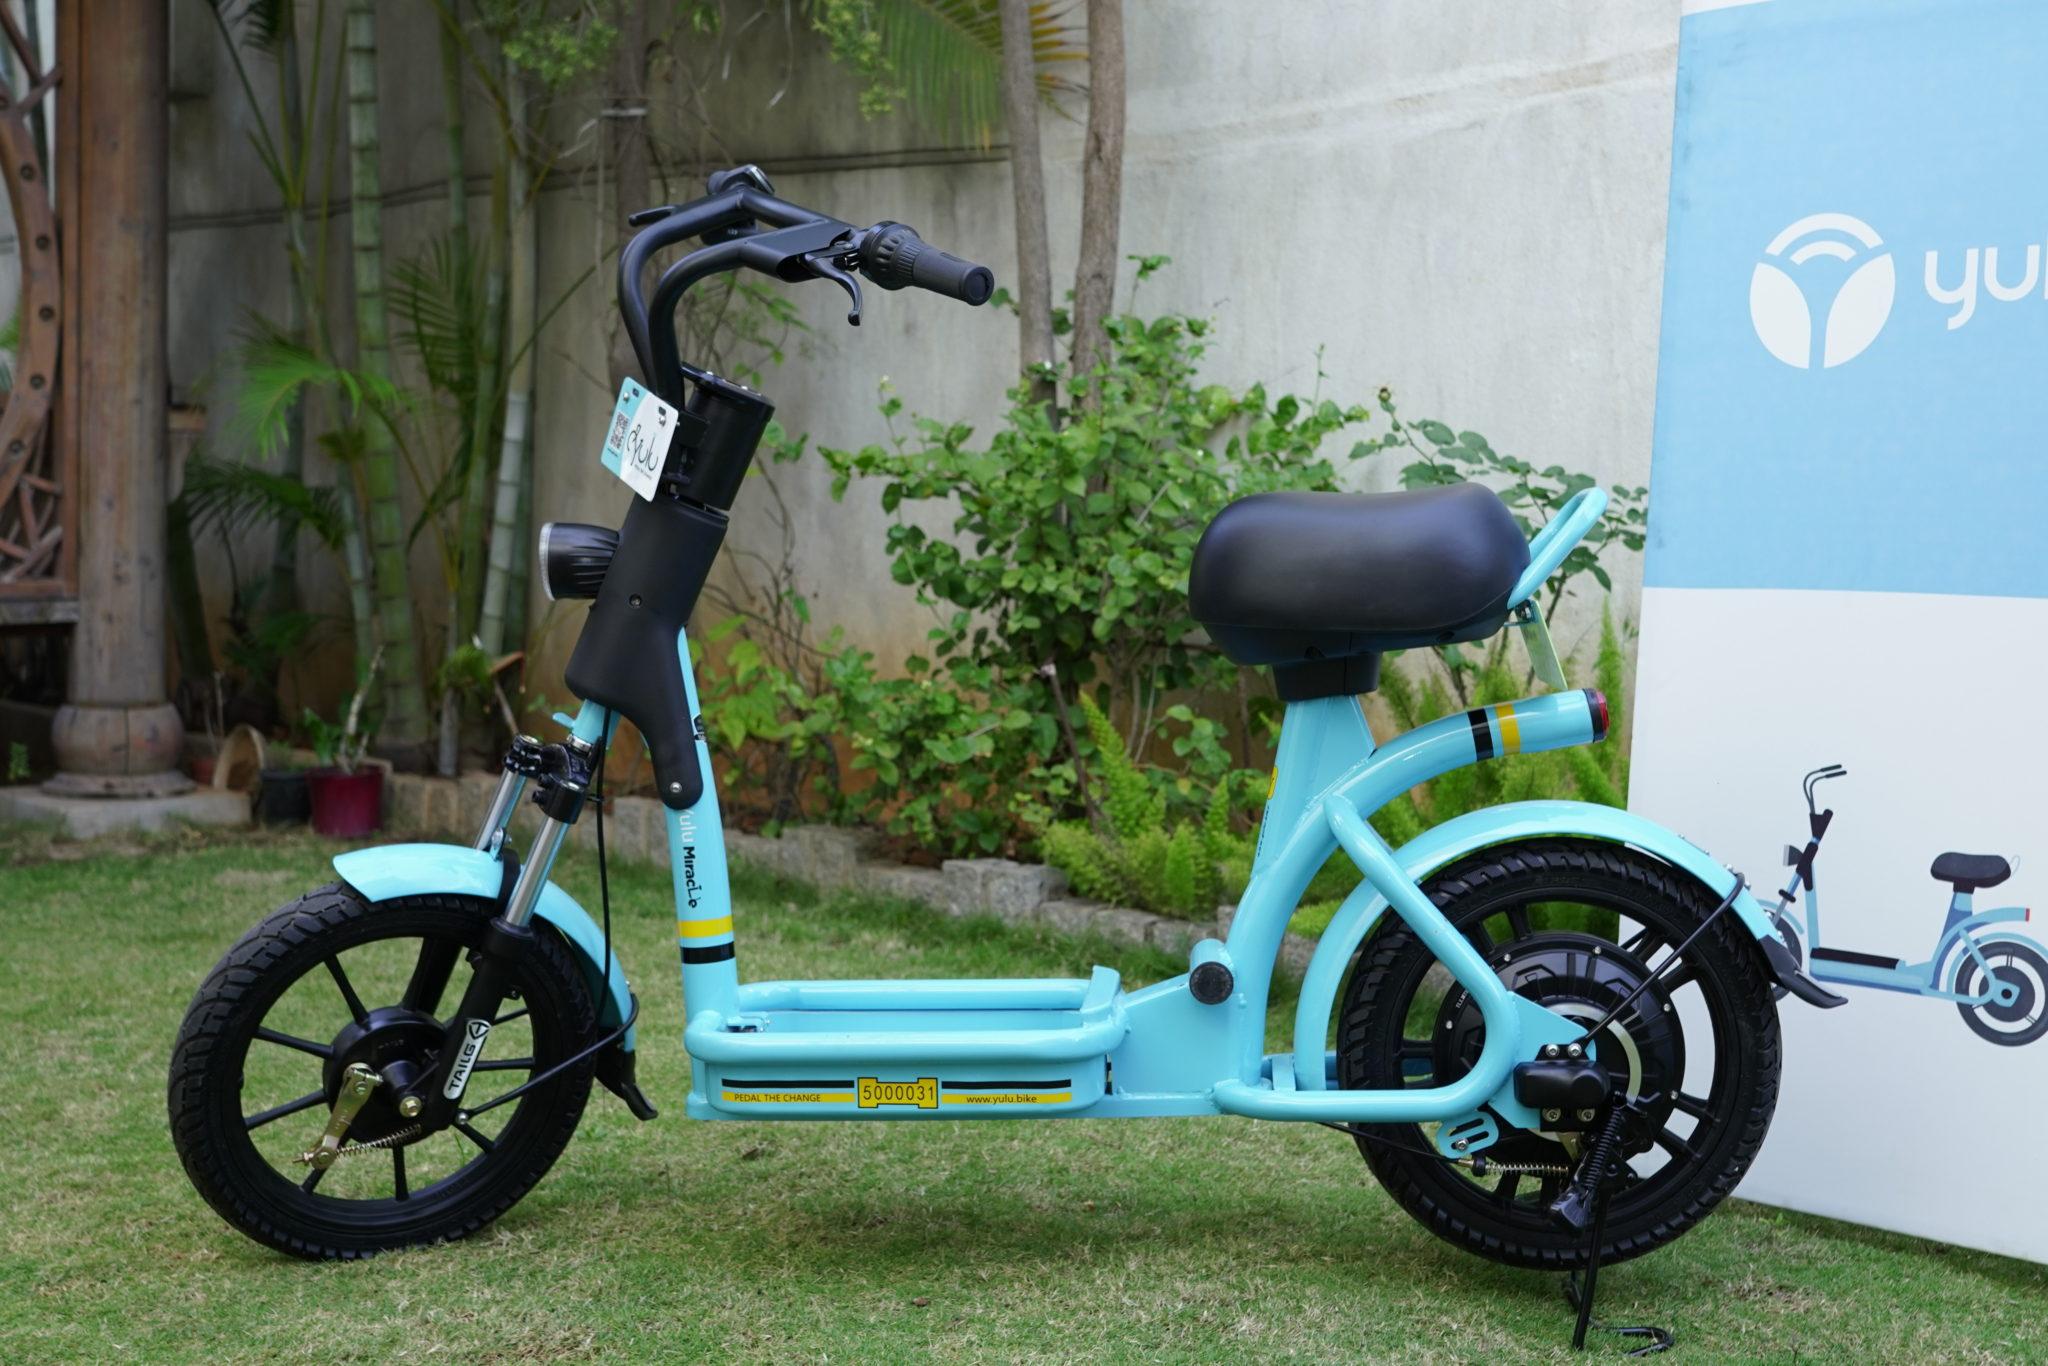 Bengaluru Startup-Yulu Electric Bike Sharing App